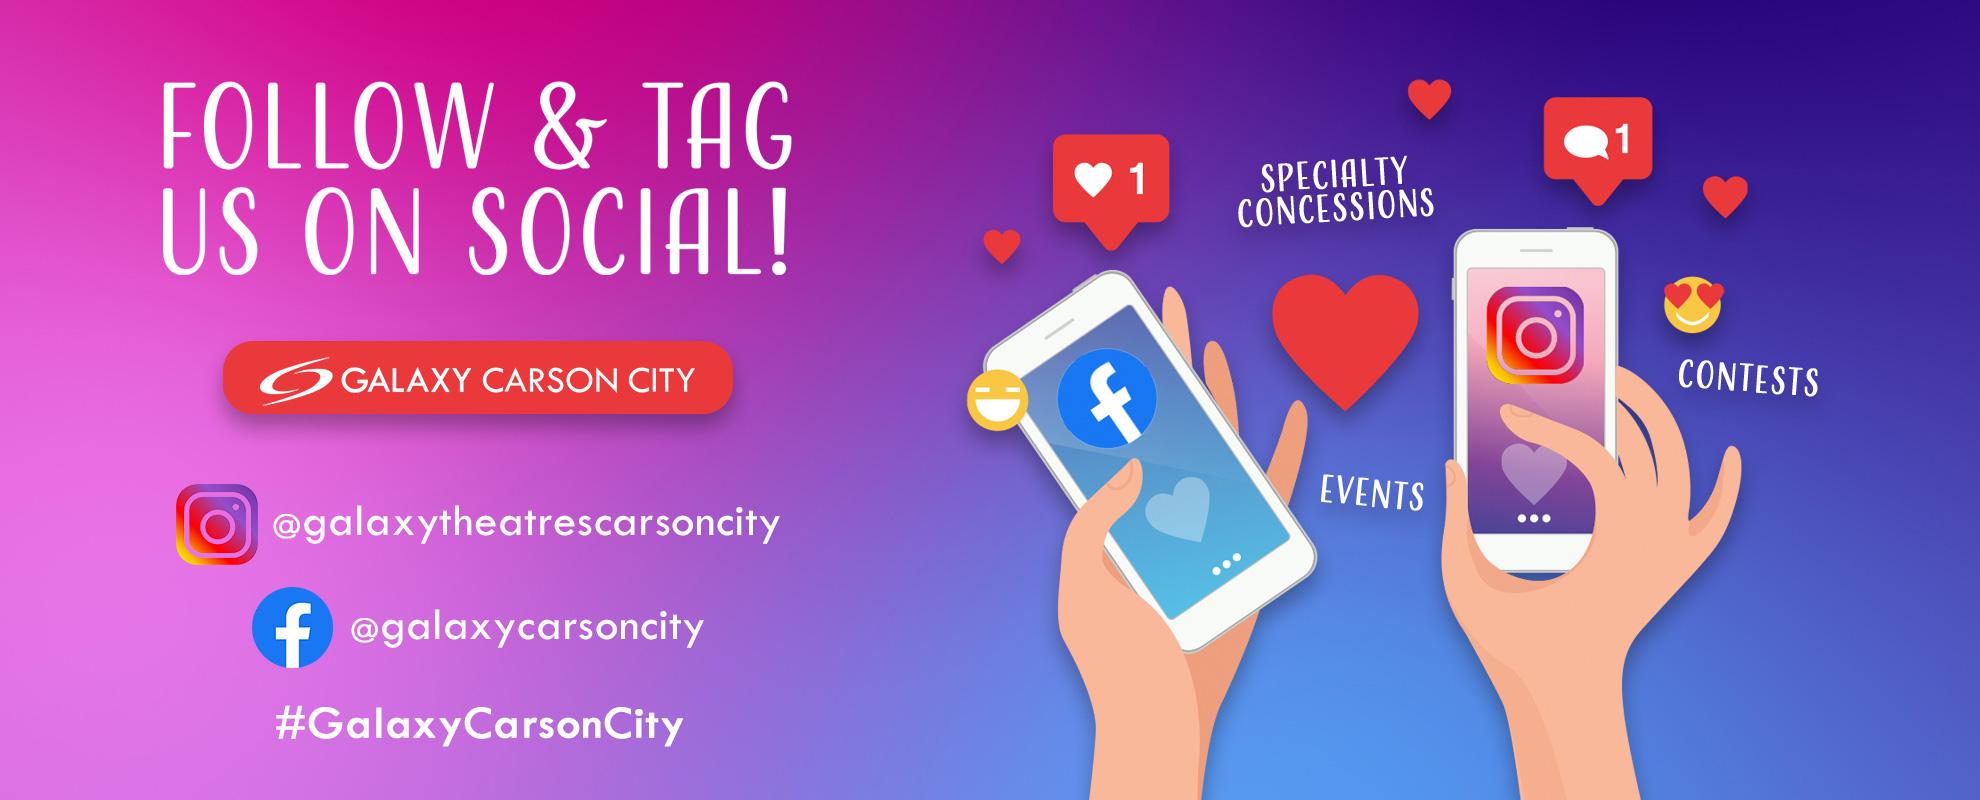 Socials/Hashtag - Carson City image